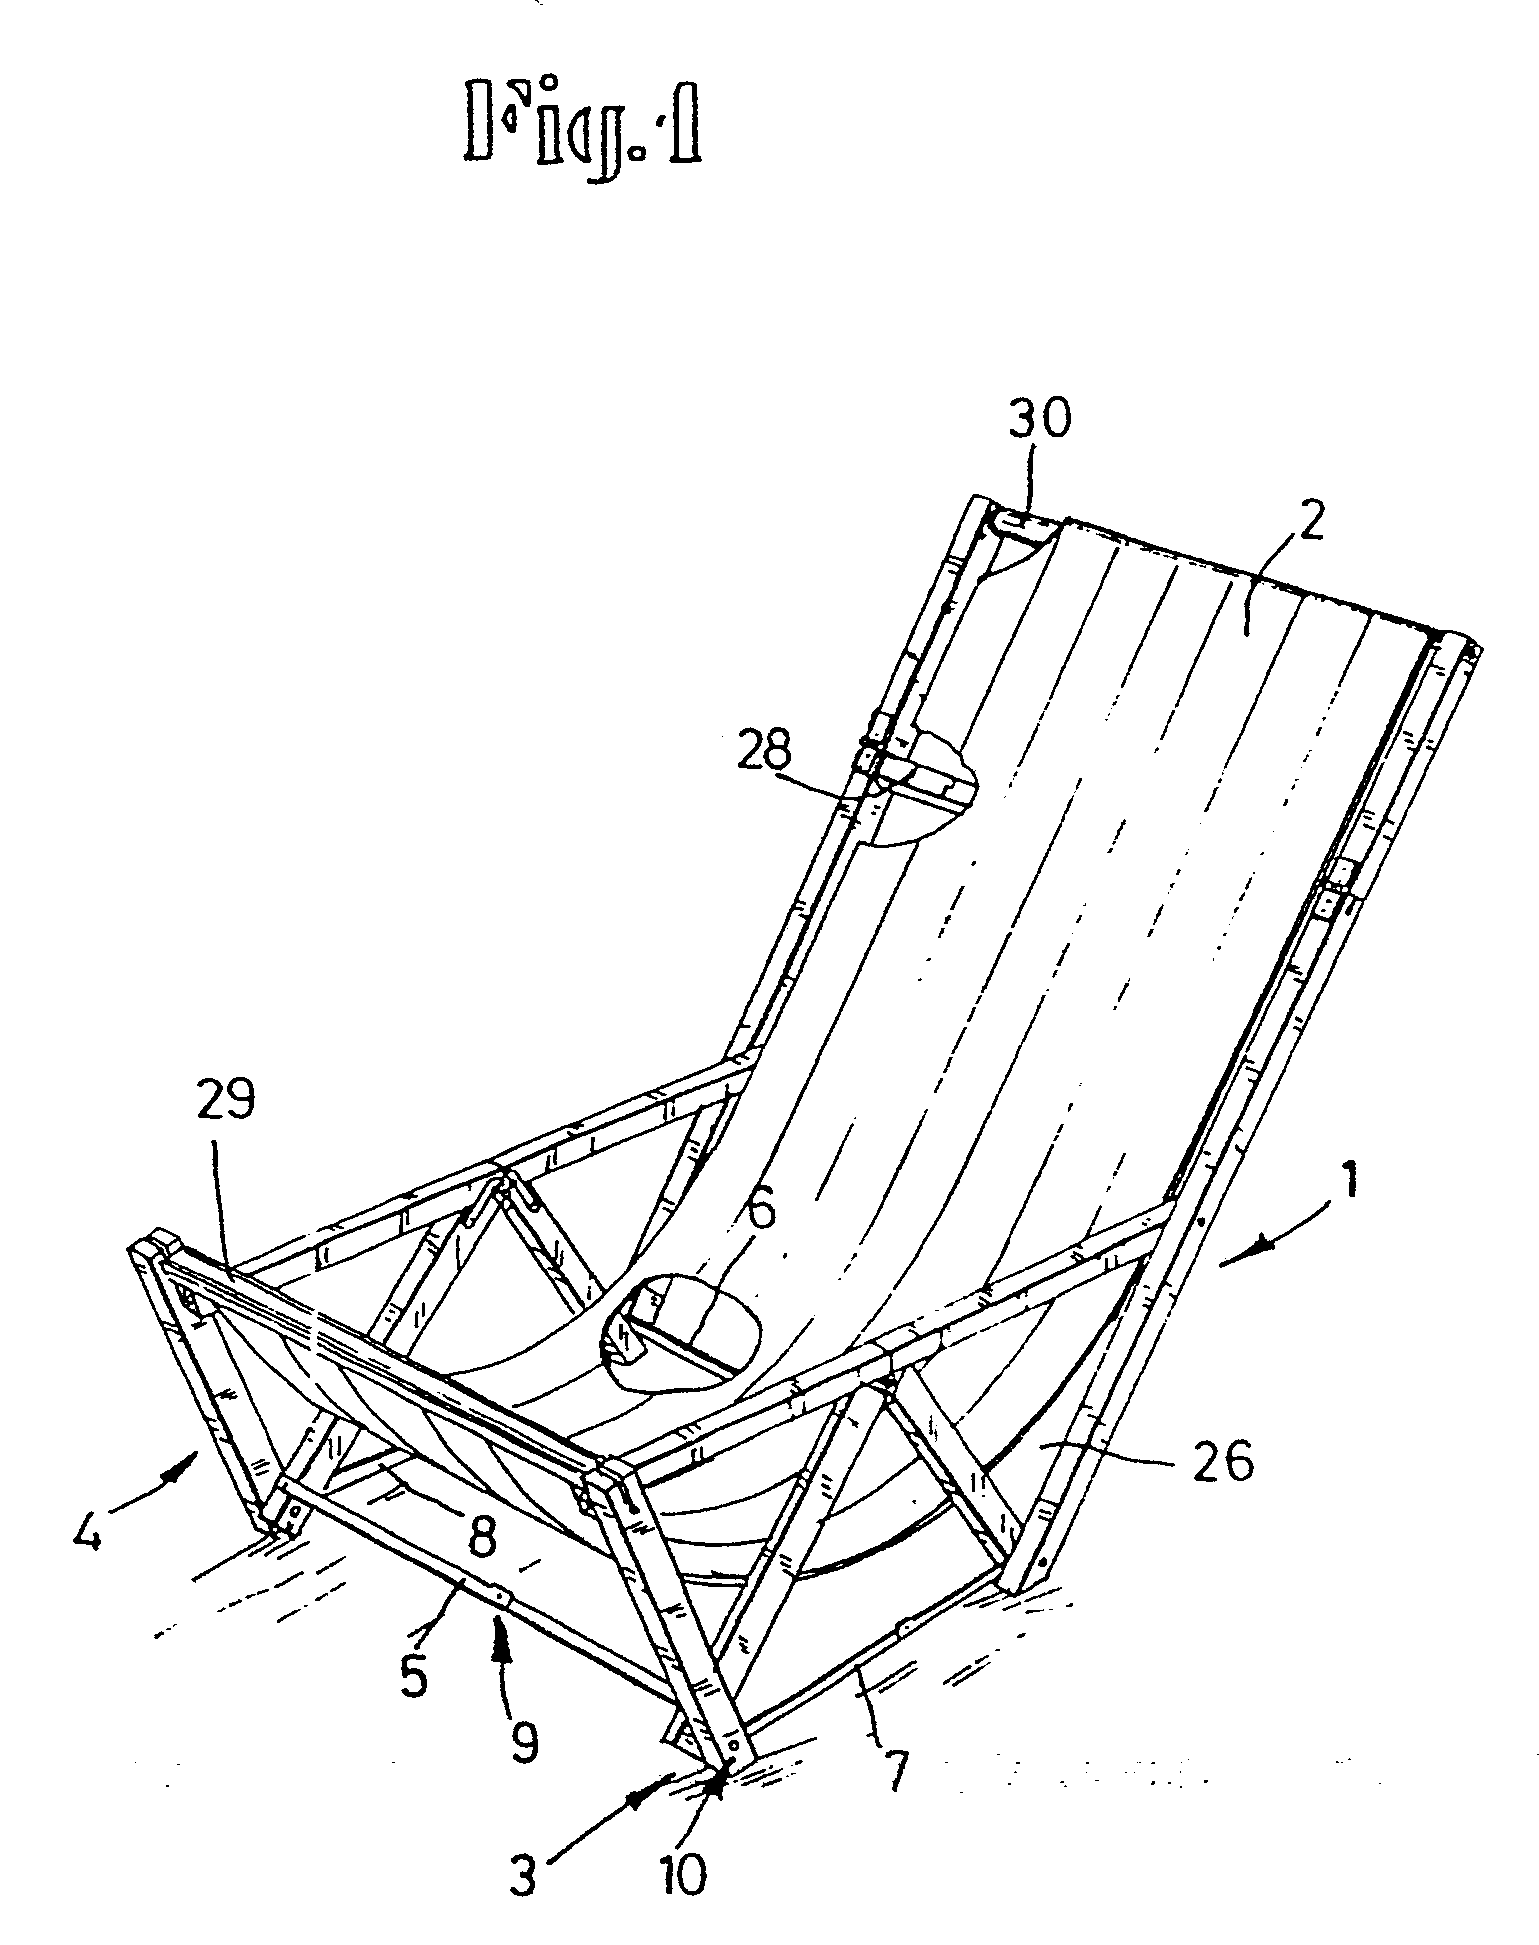 Liegestuhl Klappliegestuhl Metall Holz Oder Kunststoff ~ Patent EP0172266A1  Zusammenfaltbarer Liegestuhl  Google Patents